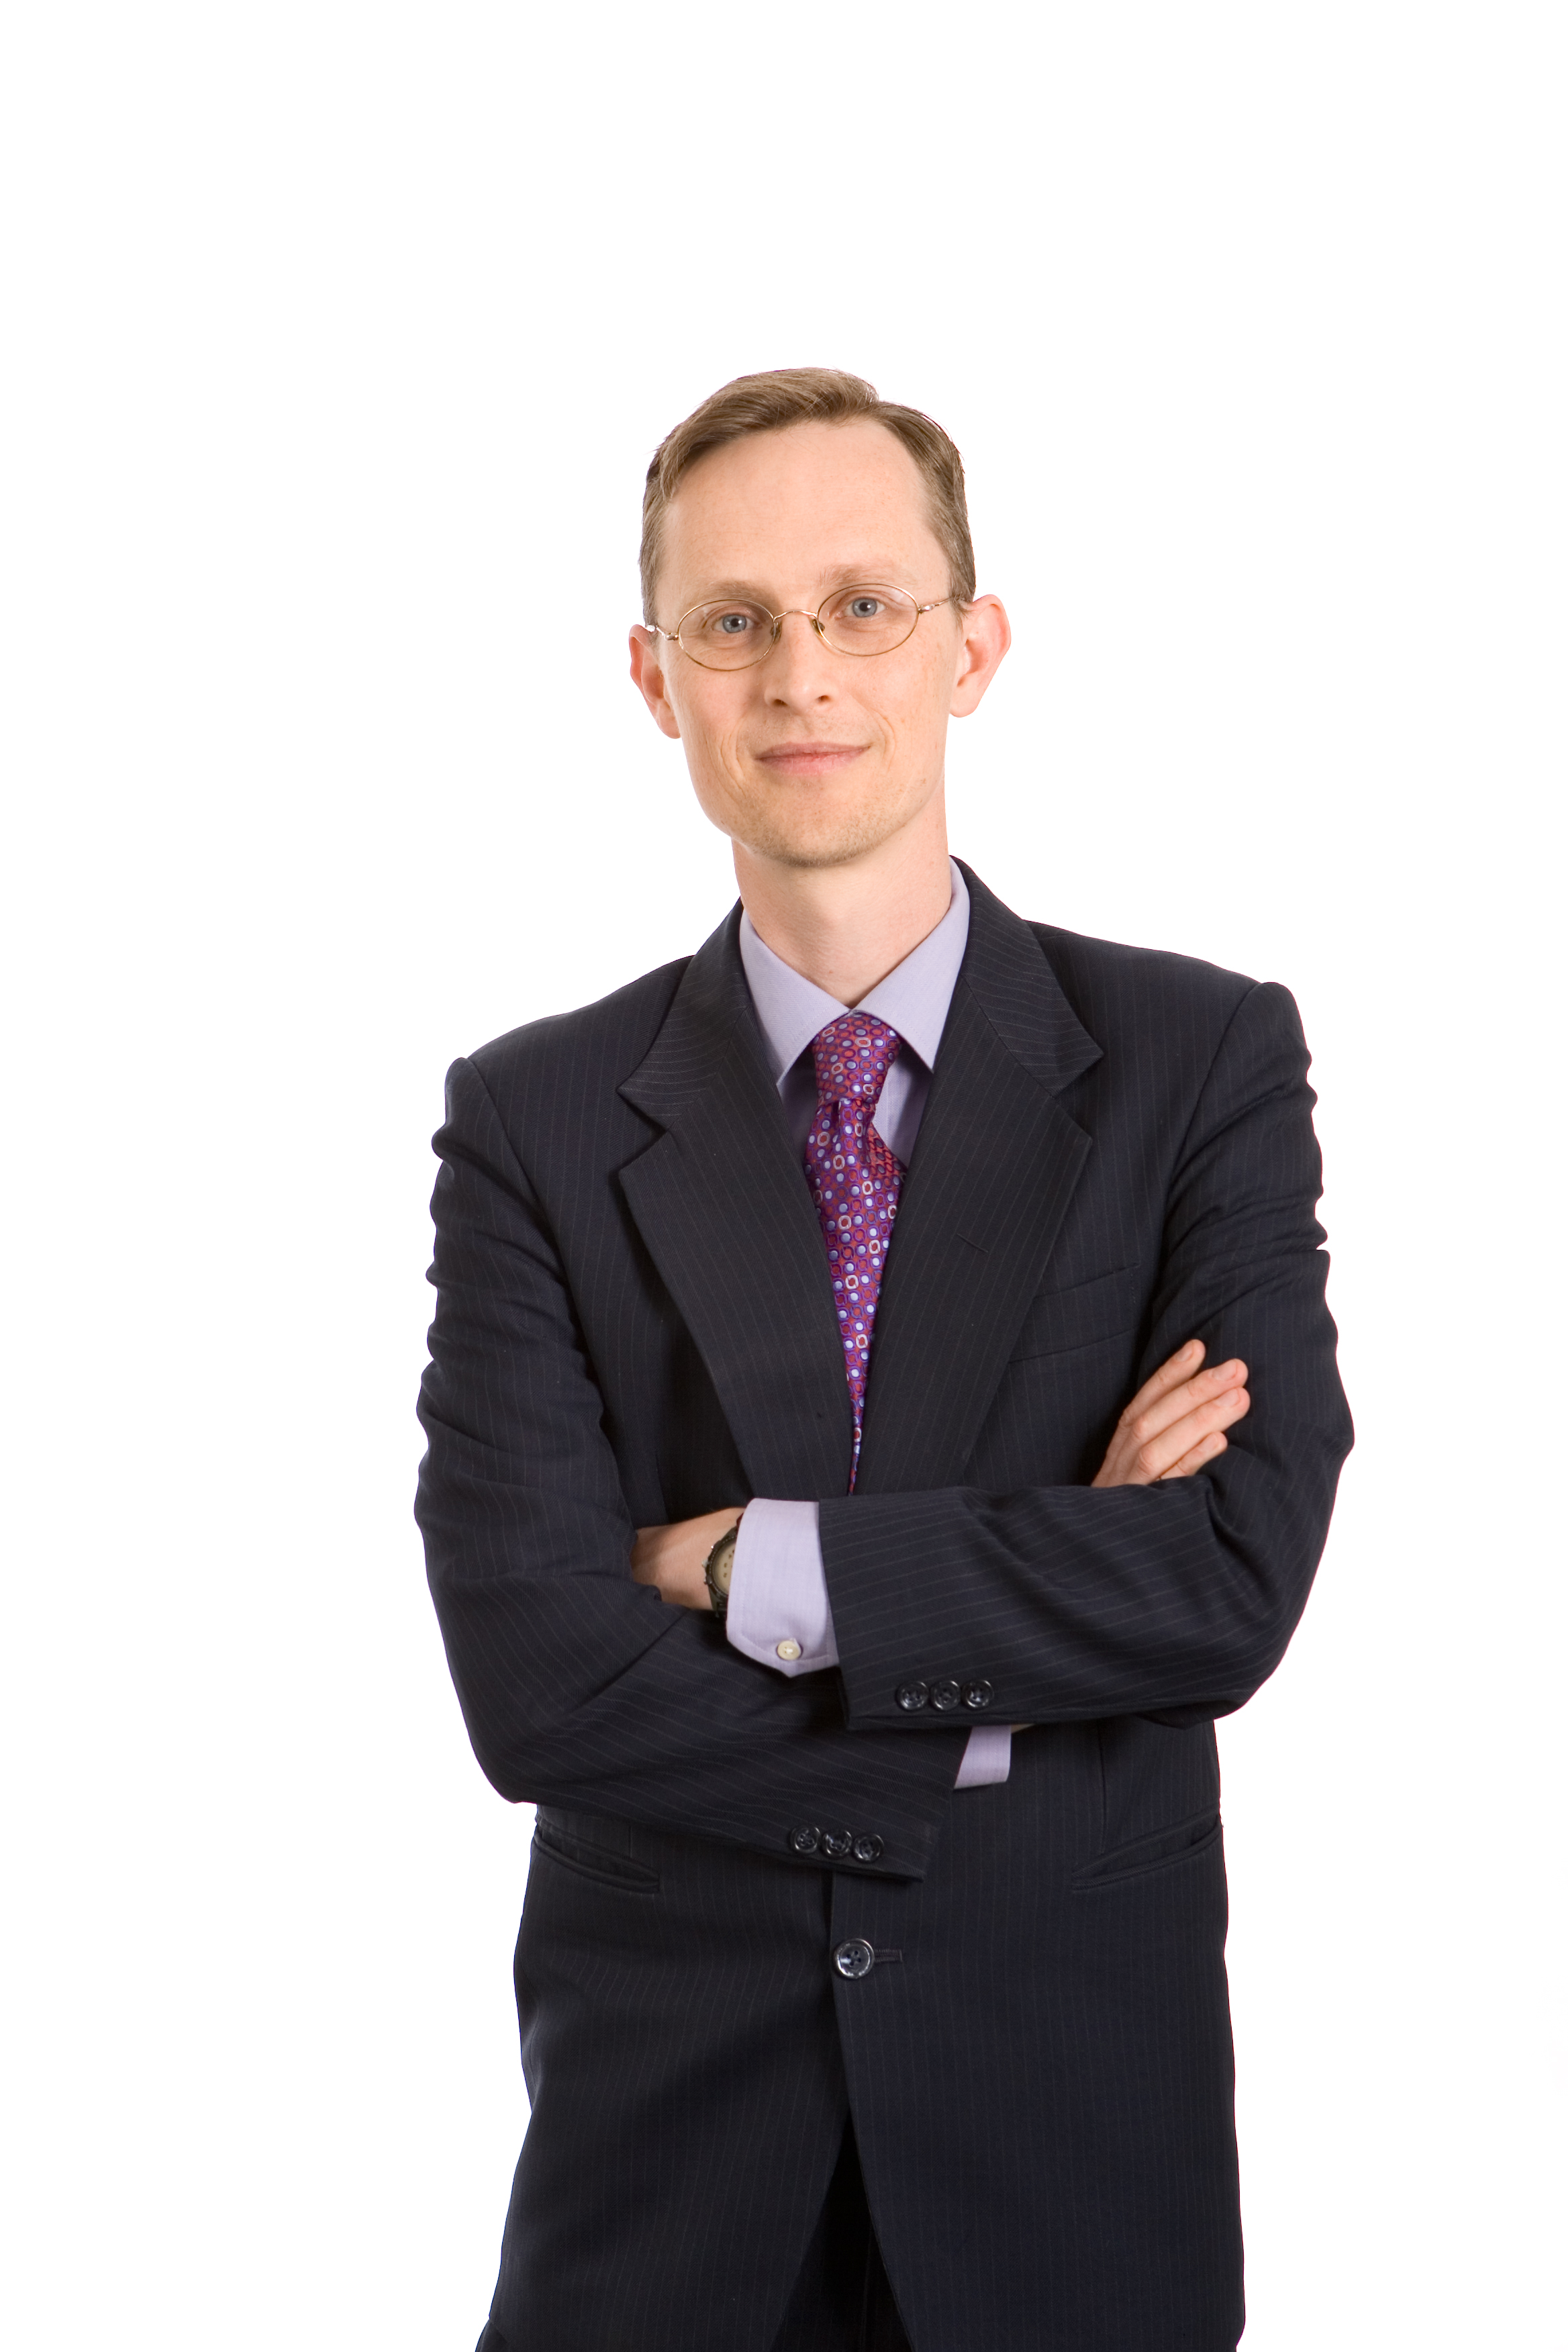 Stephen Warne,   LL.B (Melb)(Hons), BA; LLM (Melb)(Hons)